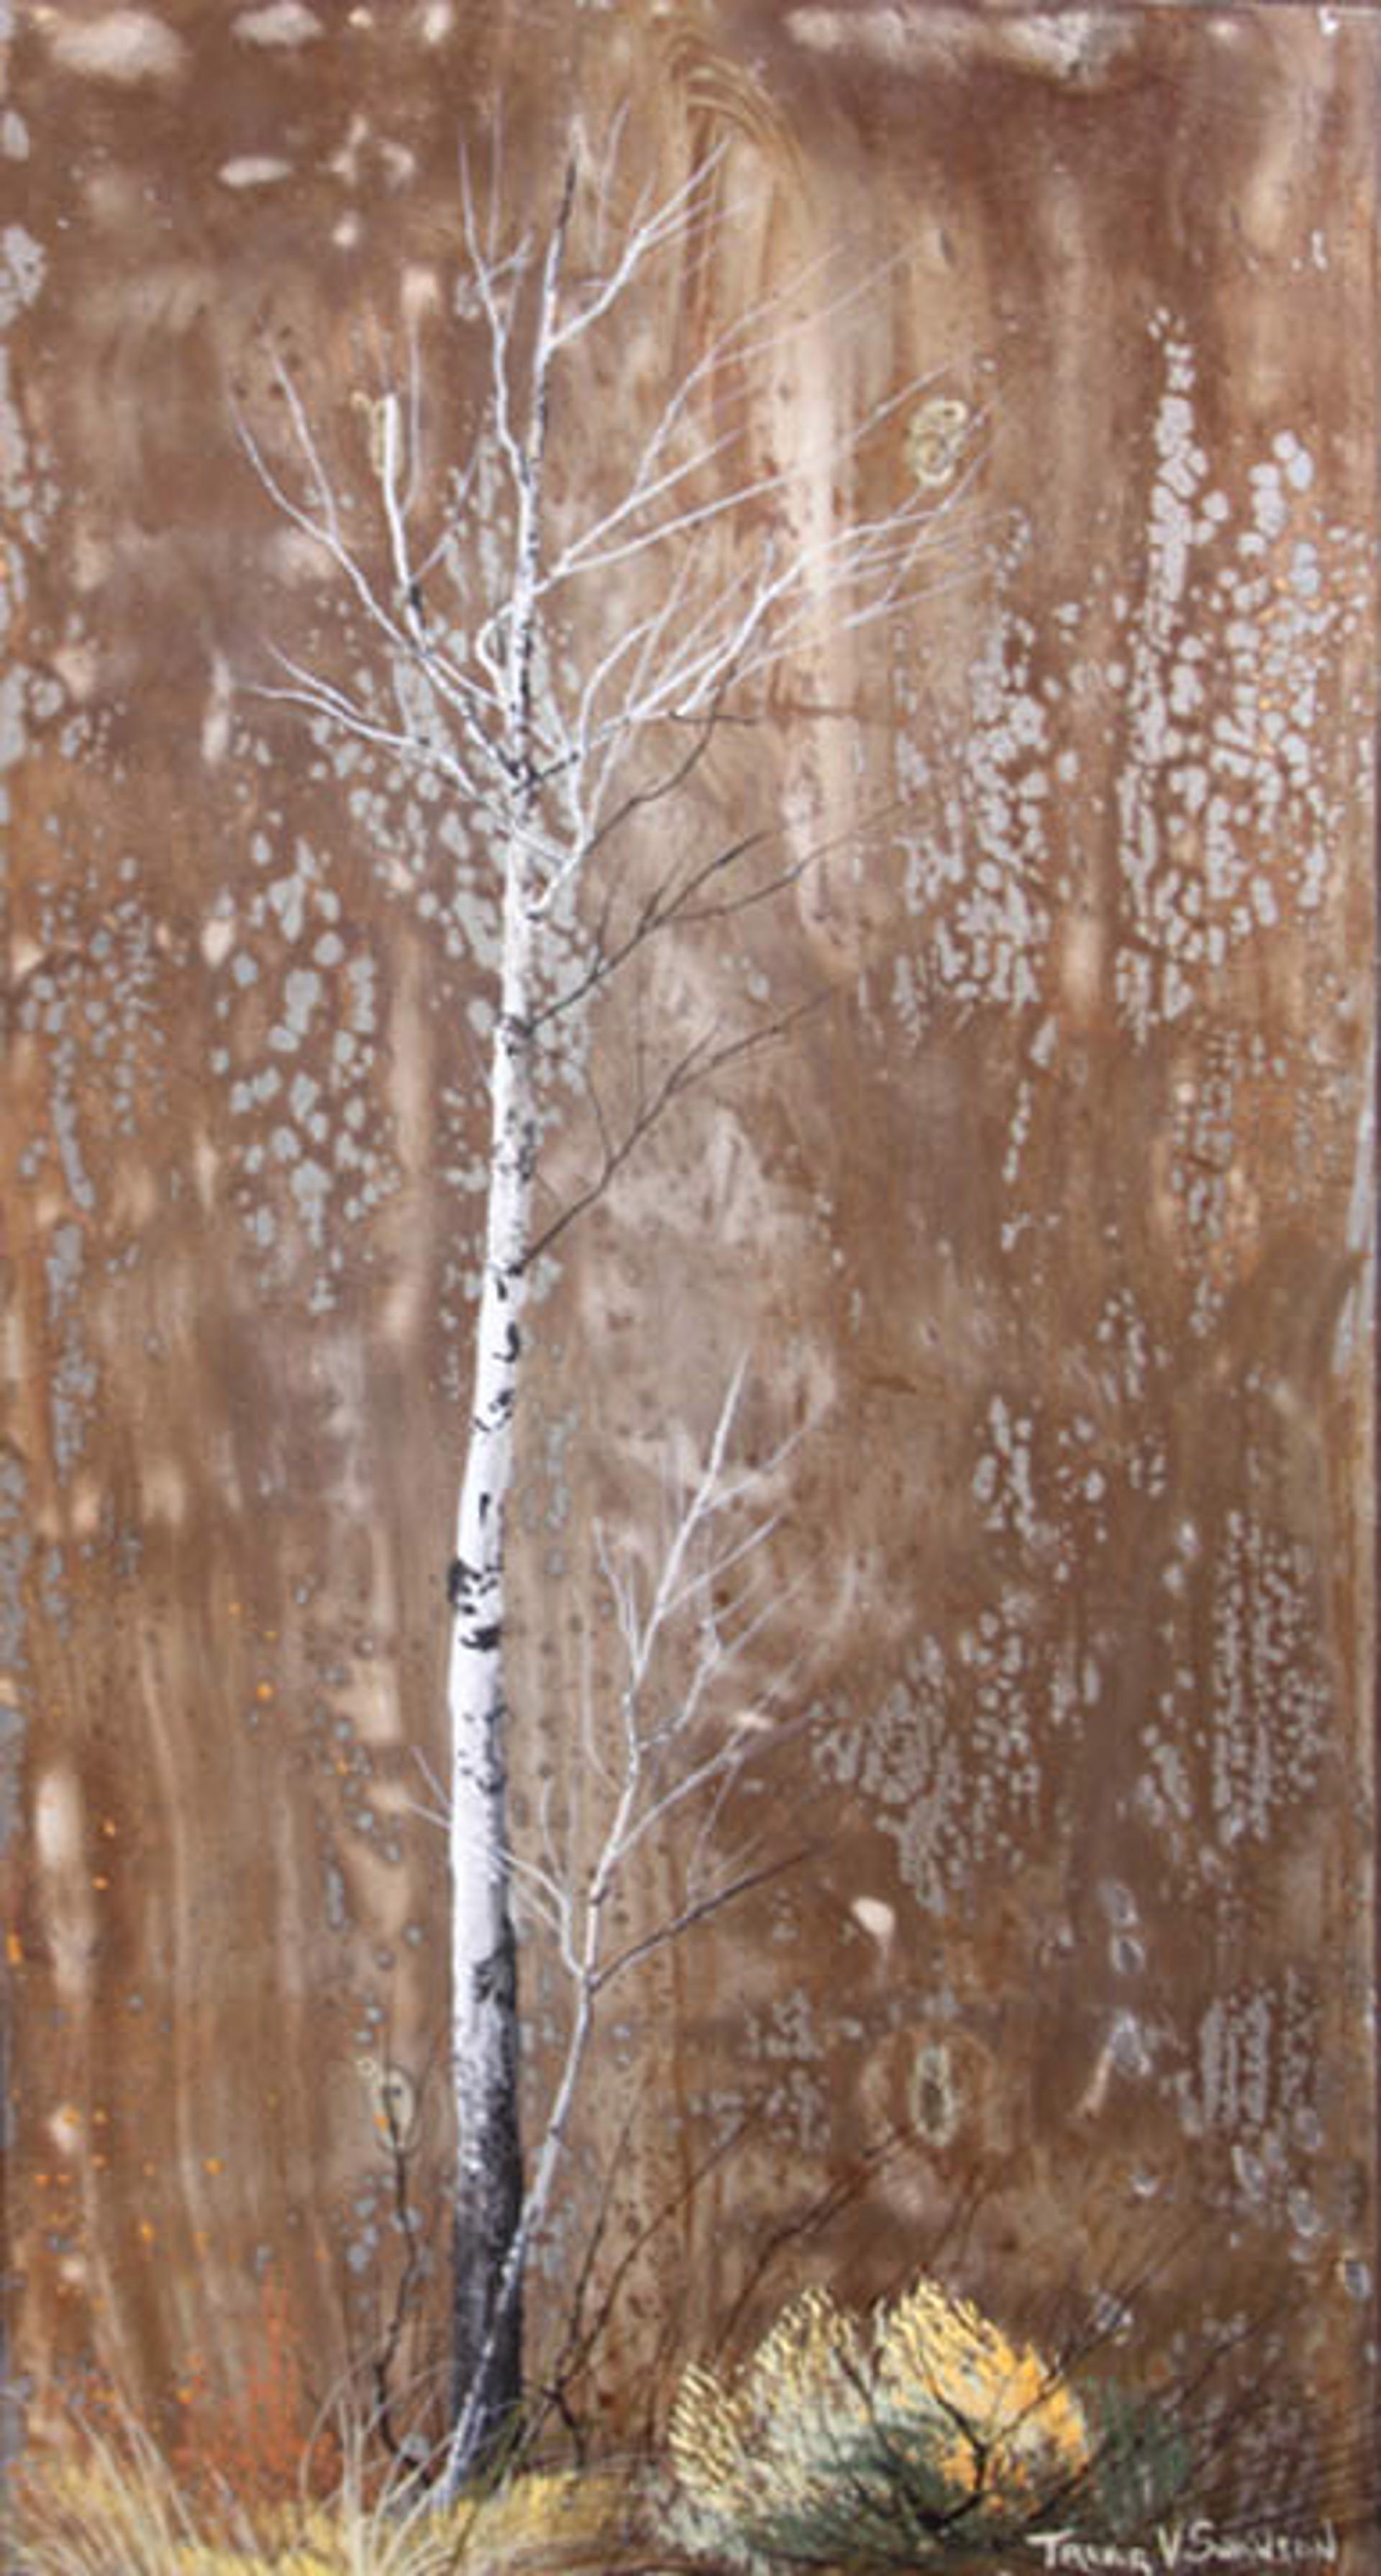 Aspen Aurora by Trevor Swanson